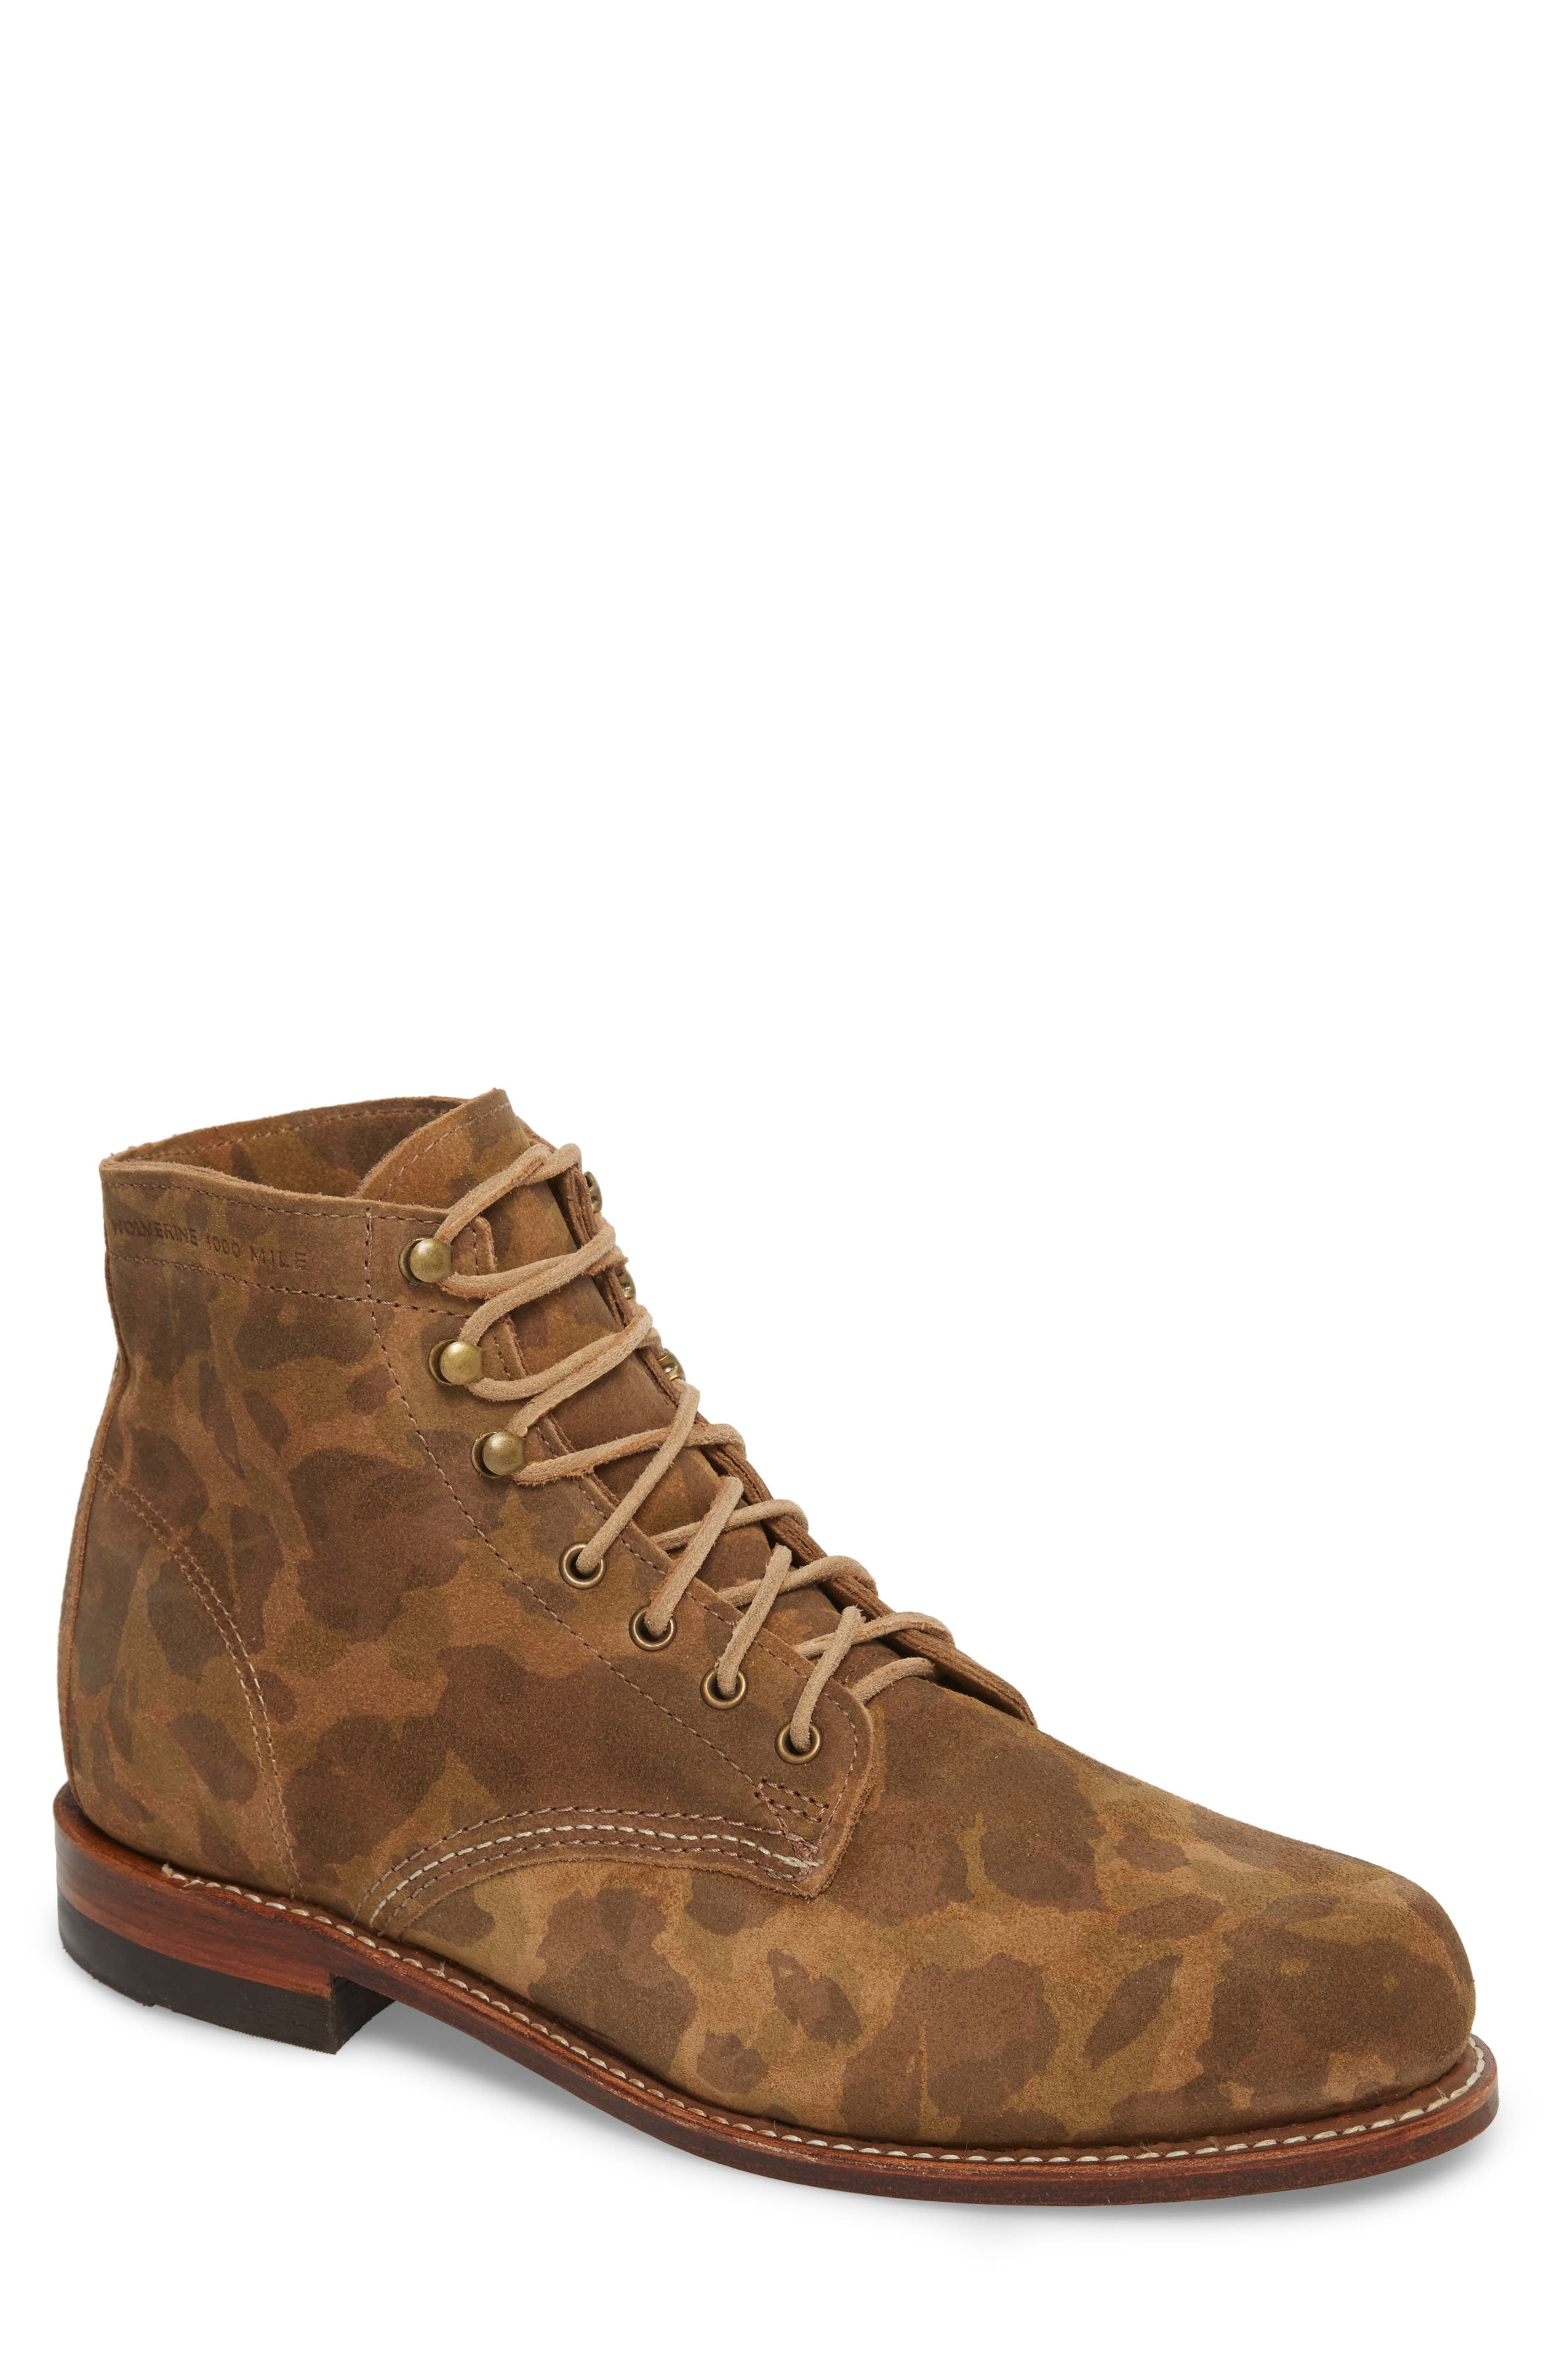 1000 Mile Original Boot,                         Main,                         color, Camo